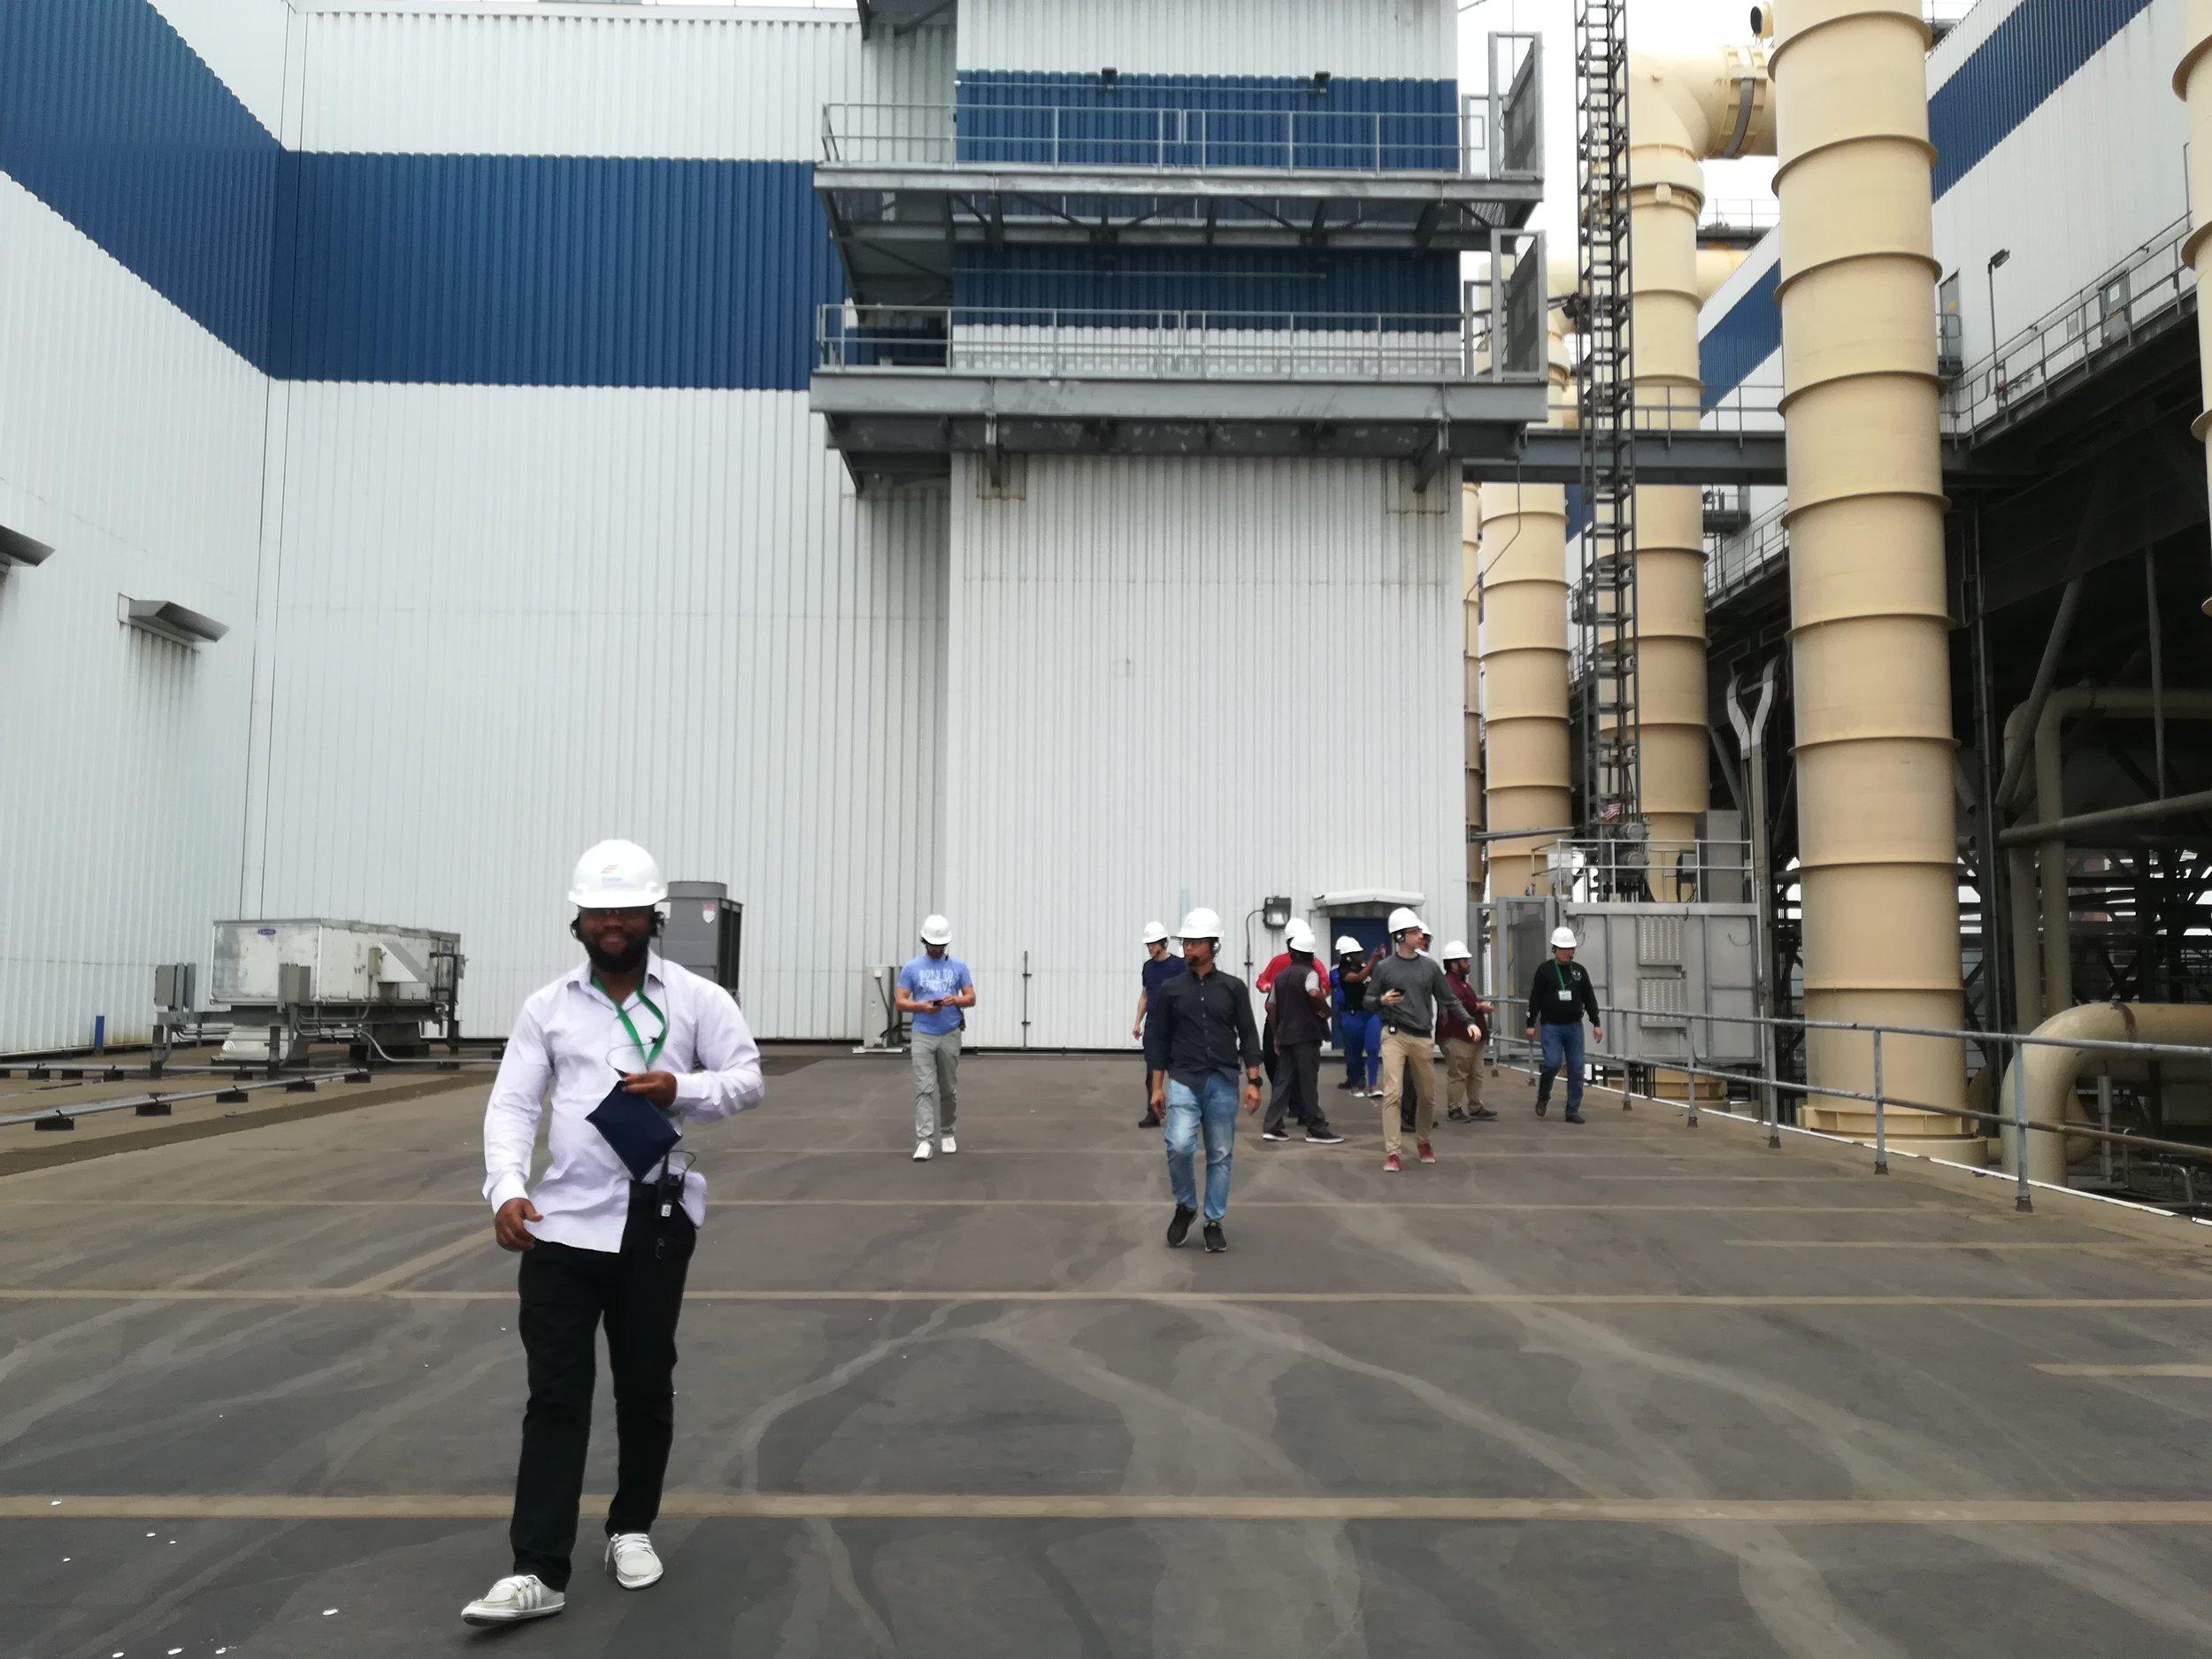 Mystic Generating Station site visit